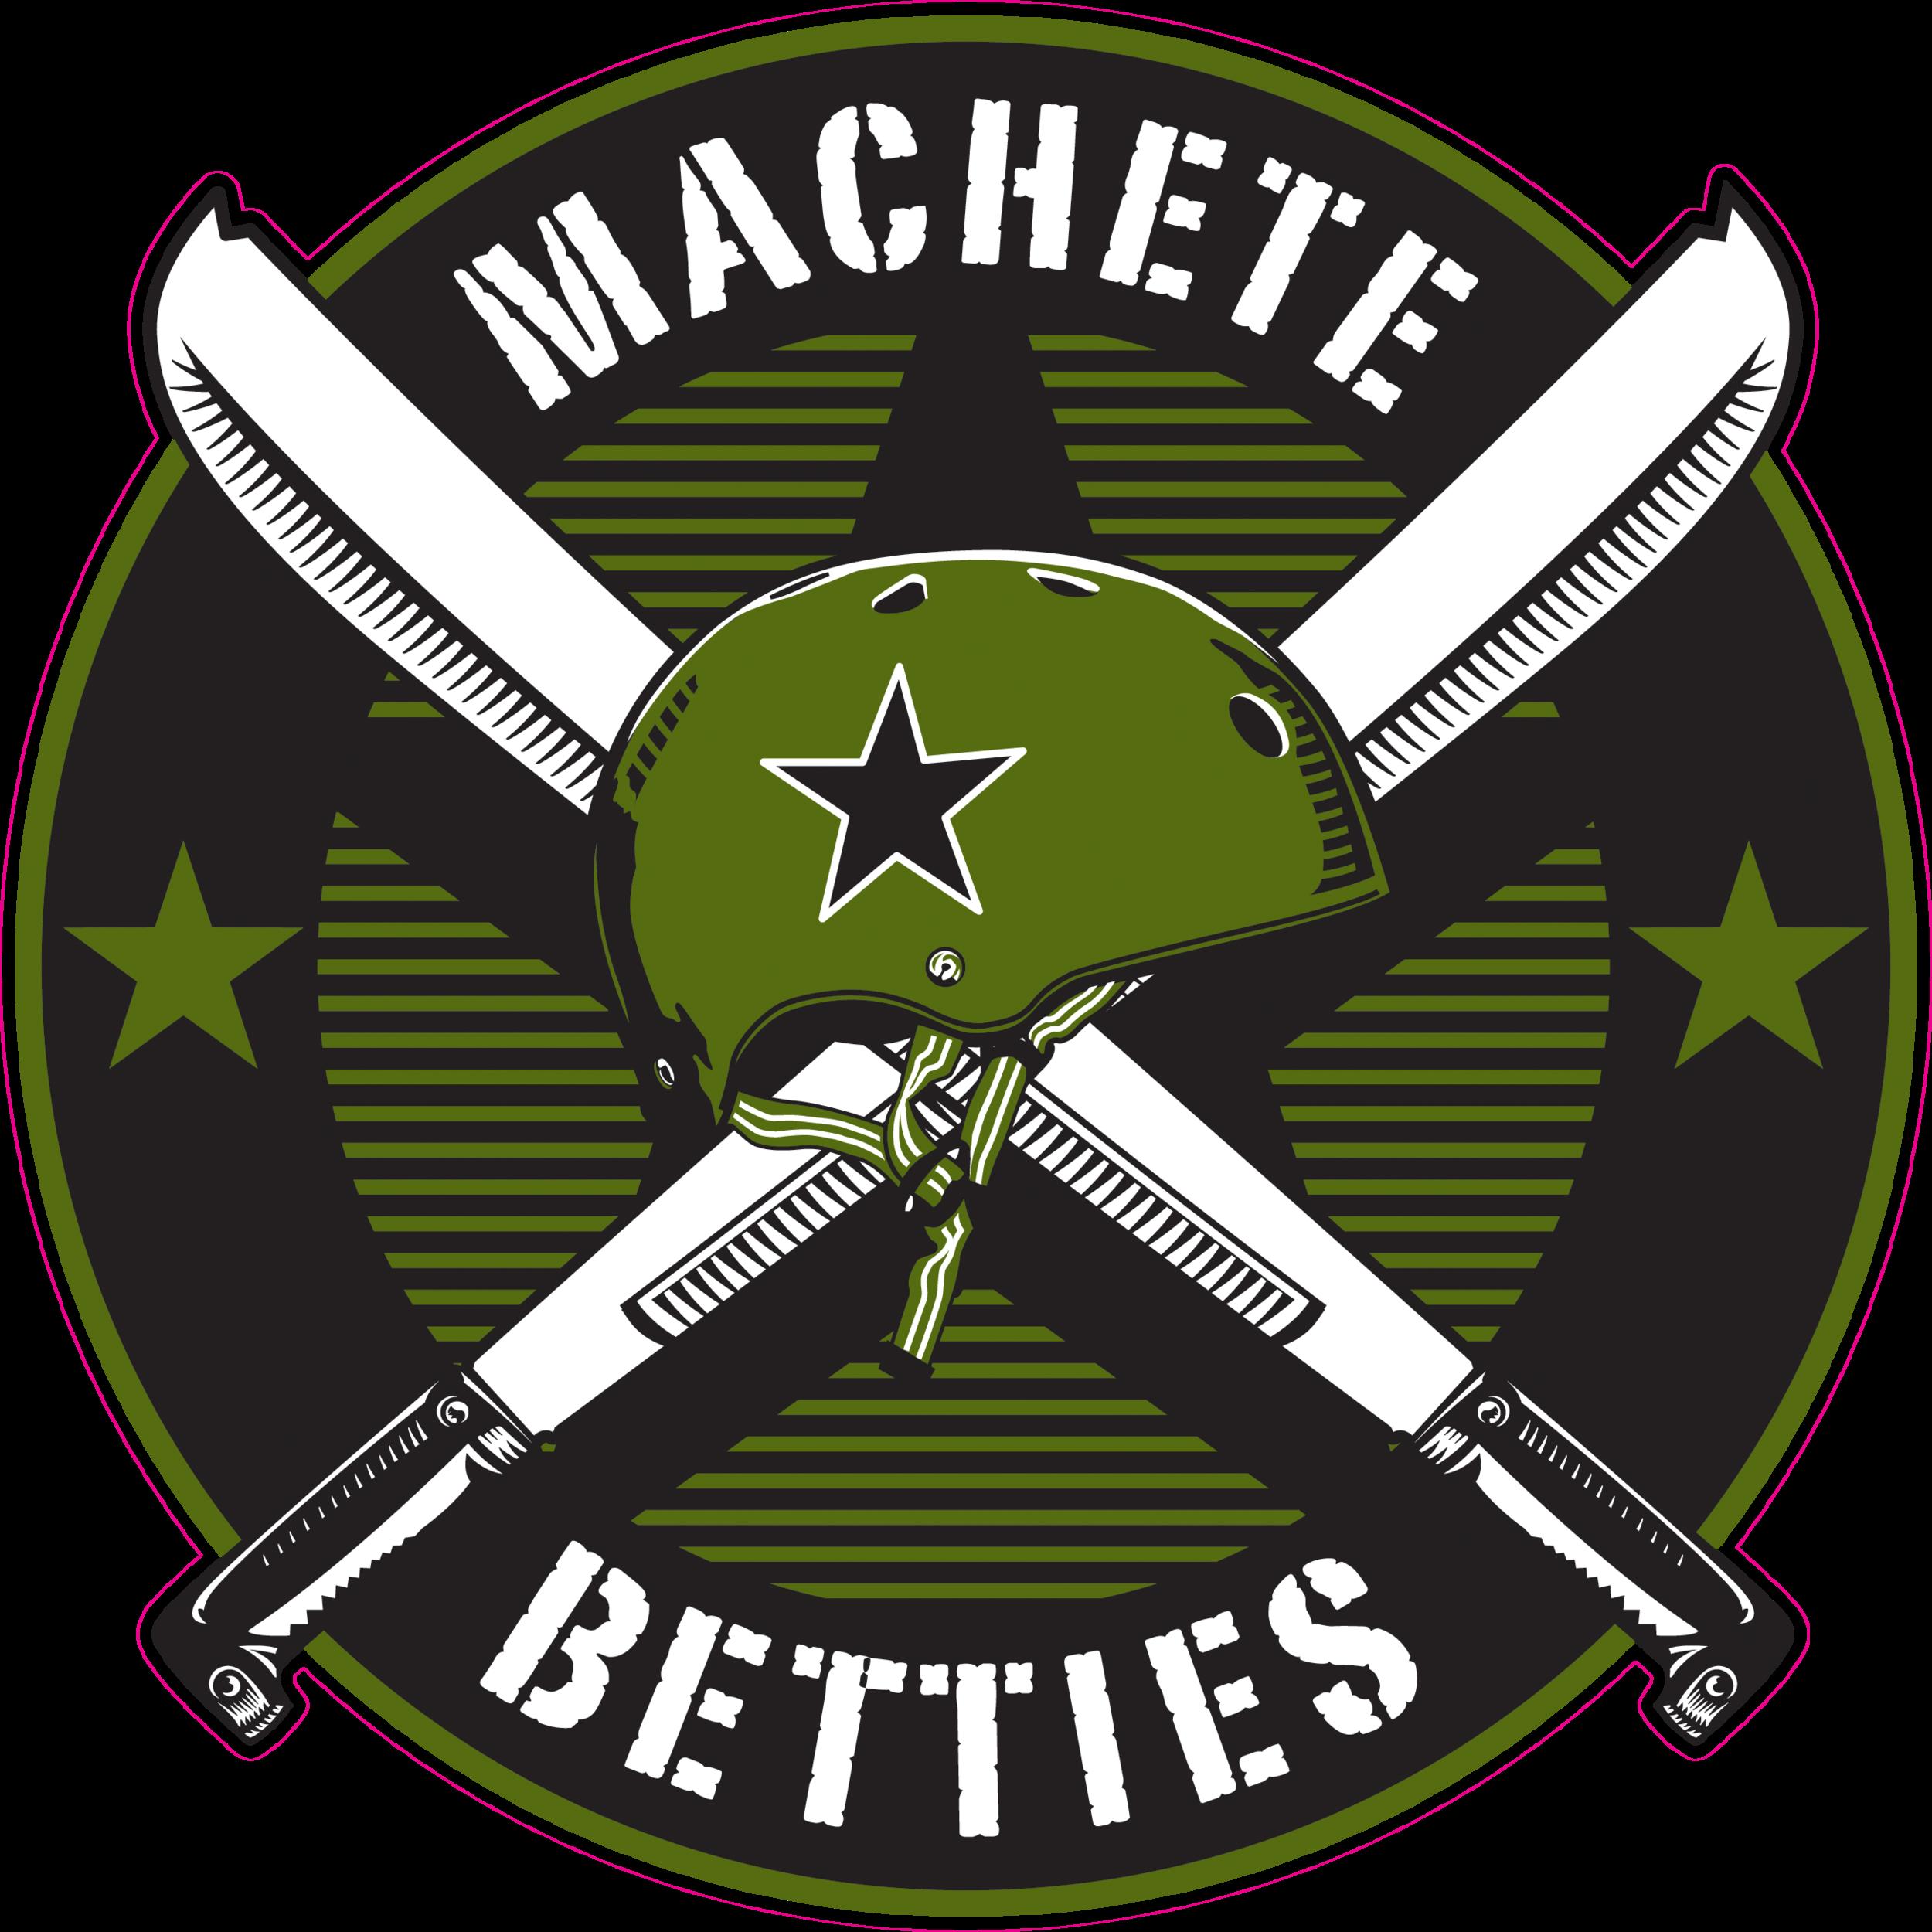 Betties Logo.png